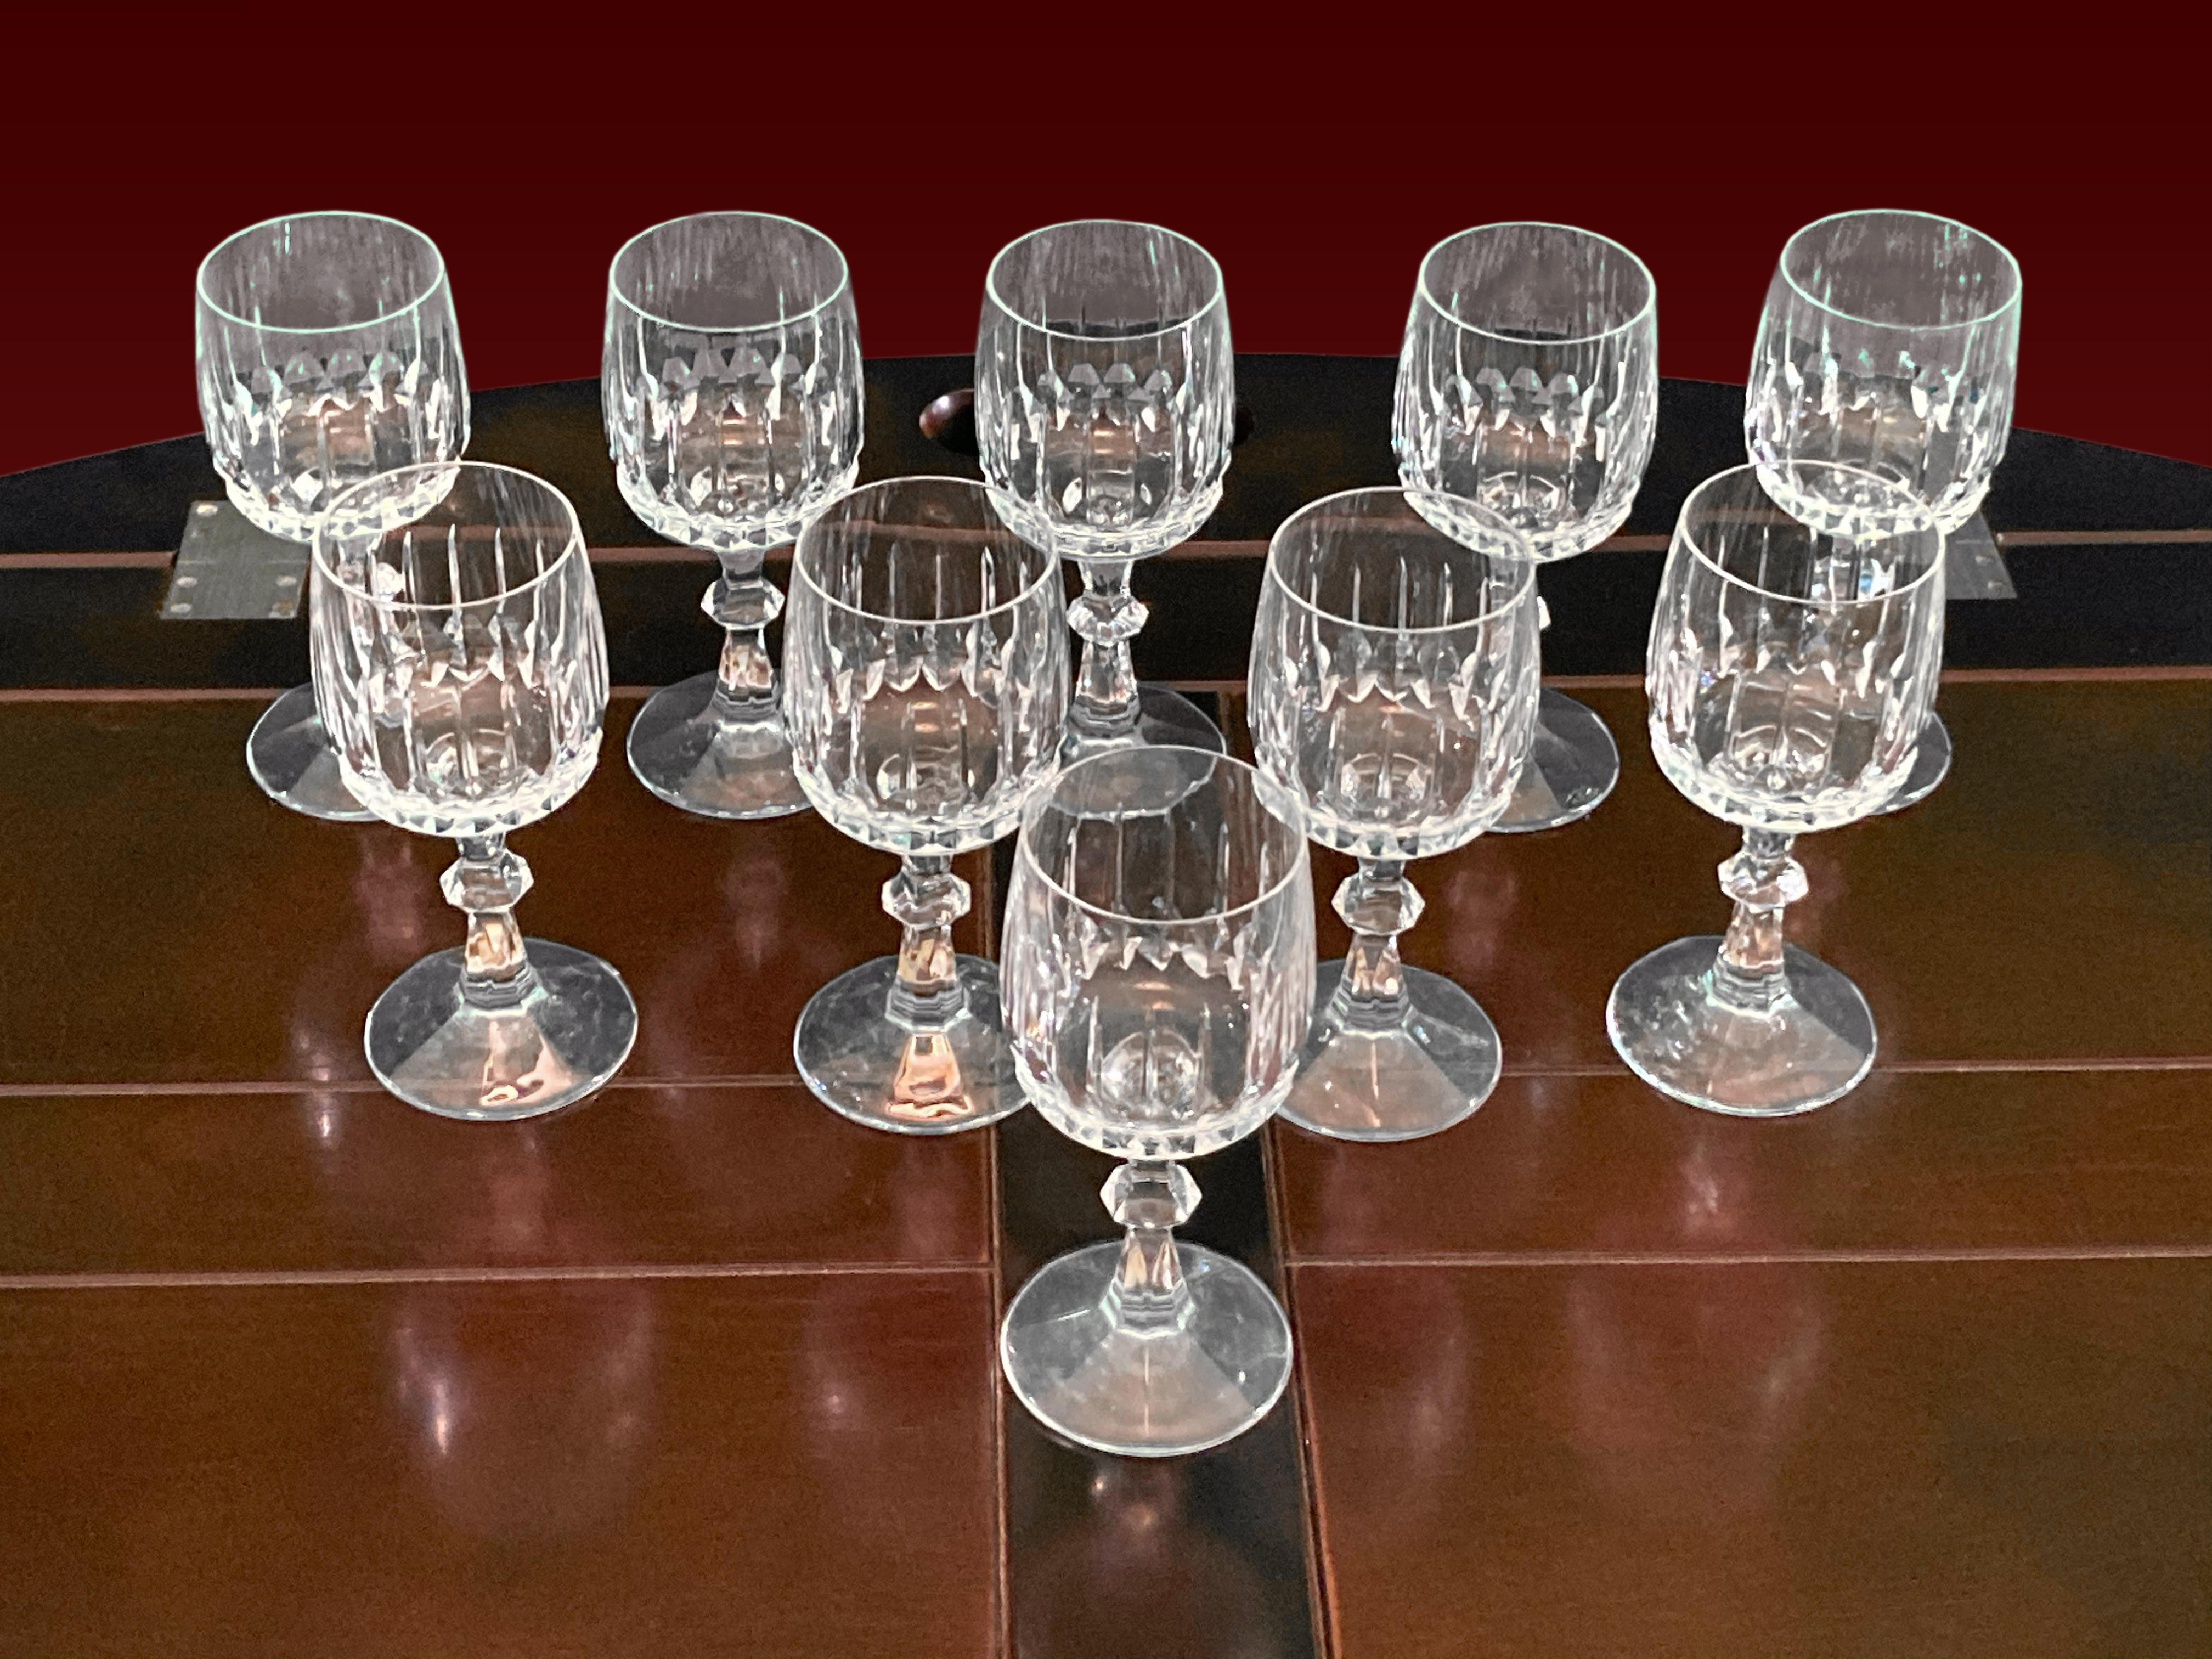 Wineglasses2-All-B copy